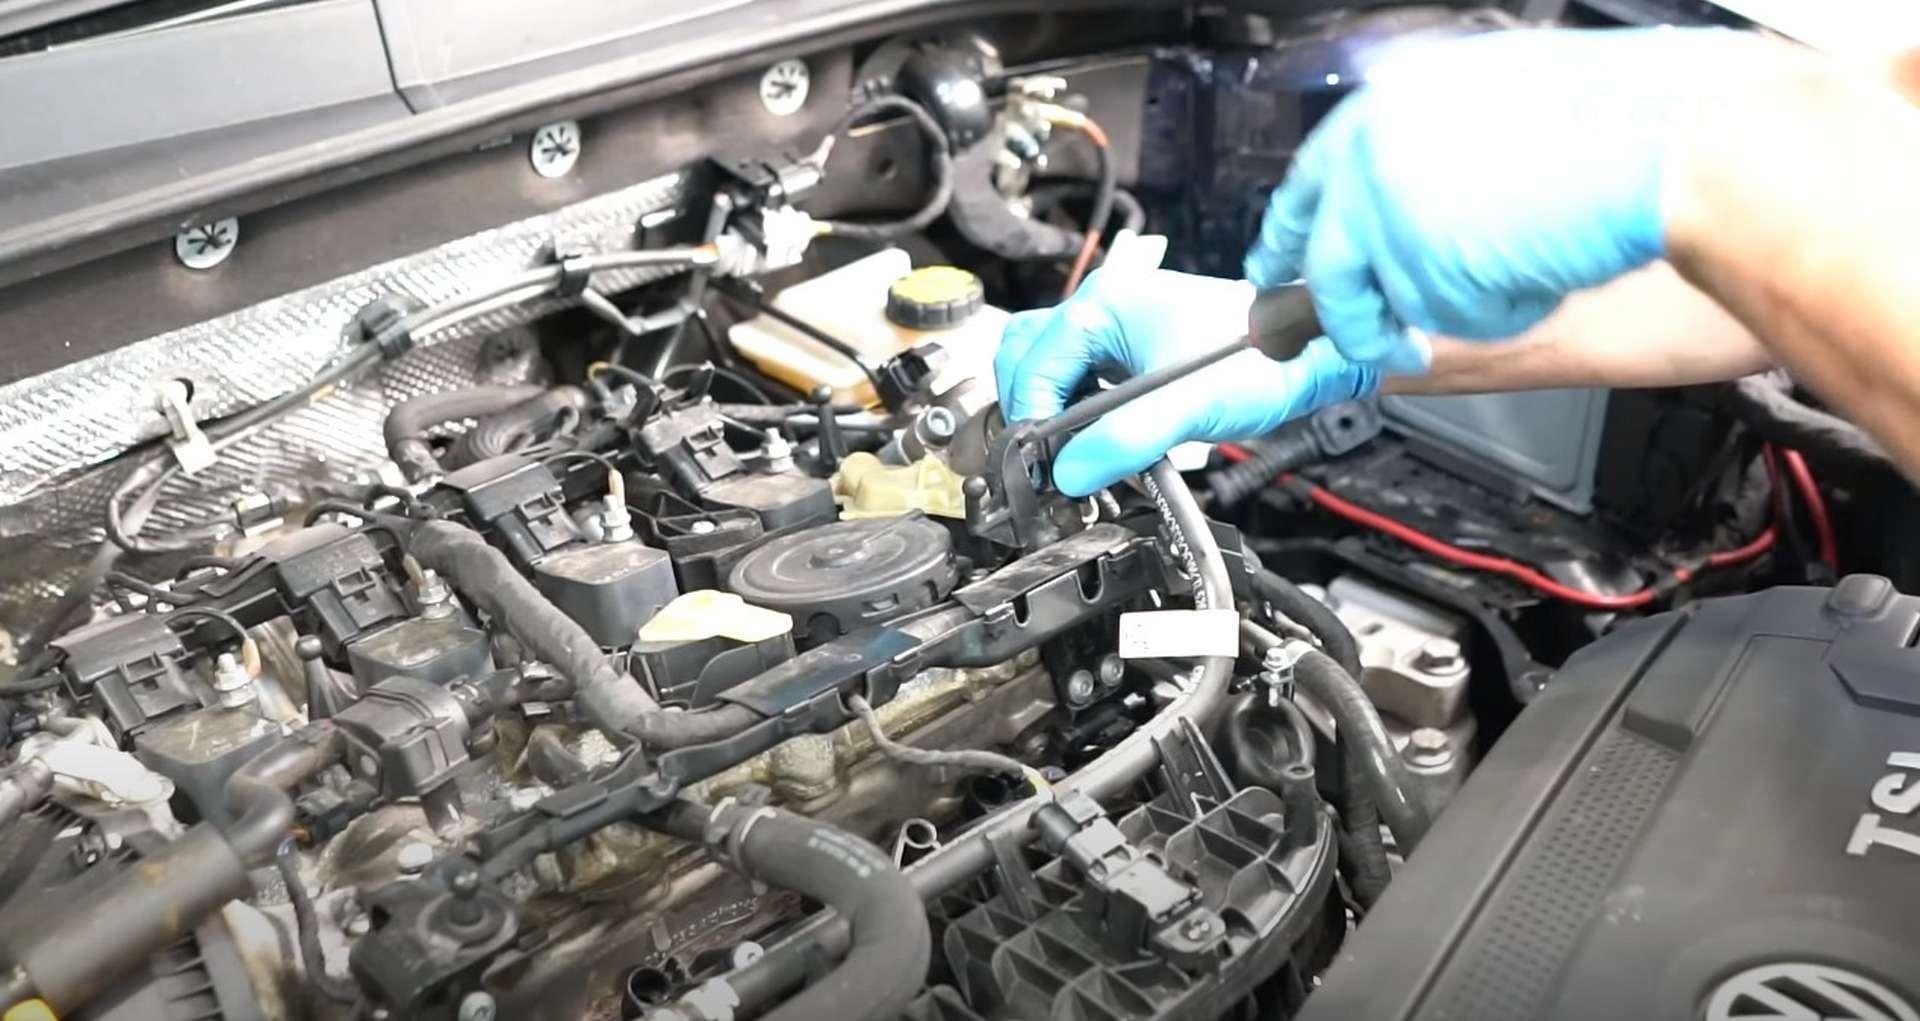 39-DIY_VW_GTI_Clutch-Job-Supporting-Engine